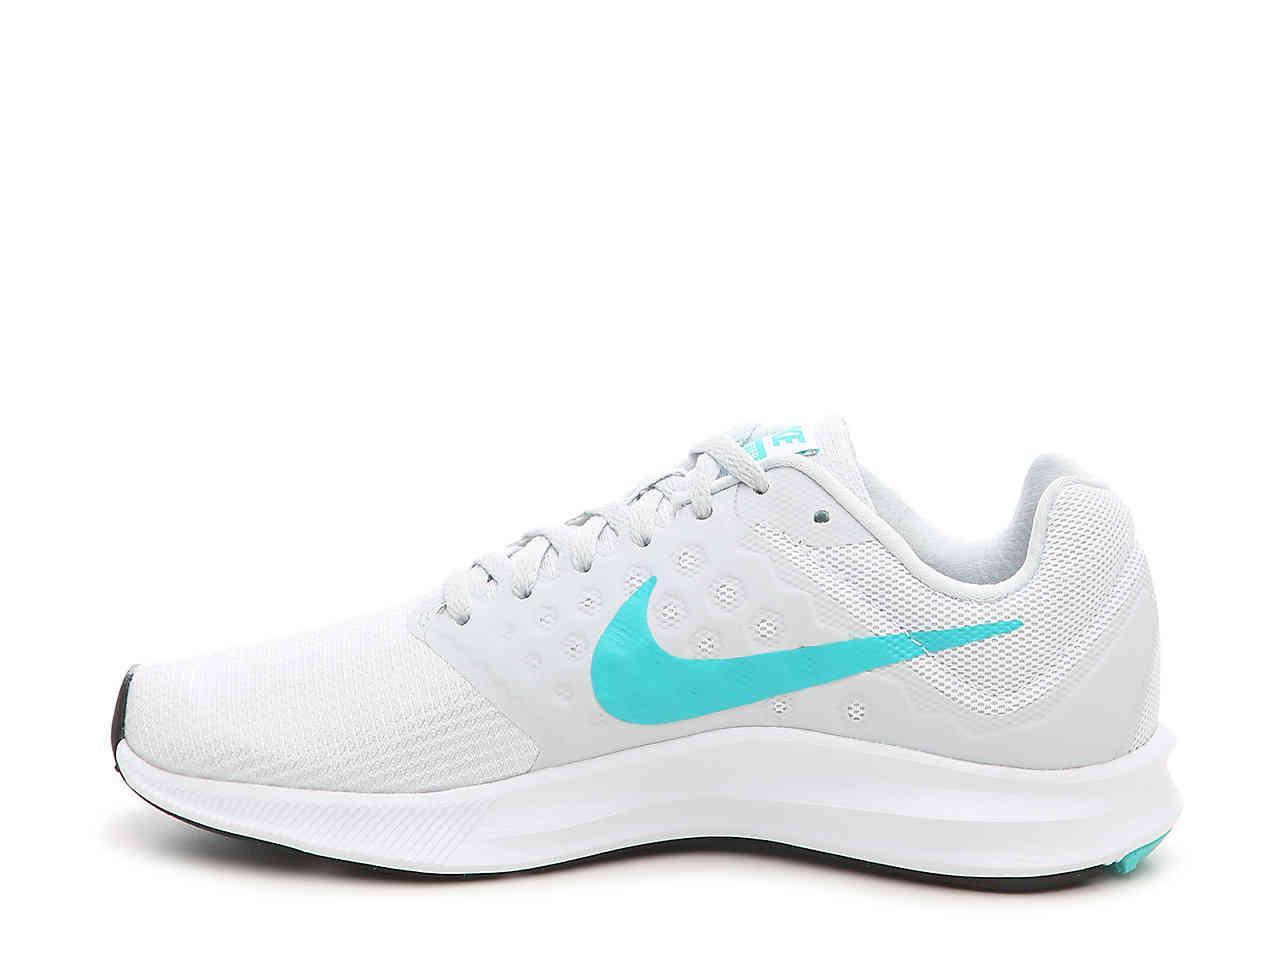 8ff2c0c31f3b0 Lyst - Nike Downshifter 7 Lightweight Running Shoe in White